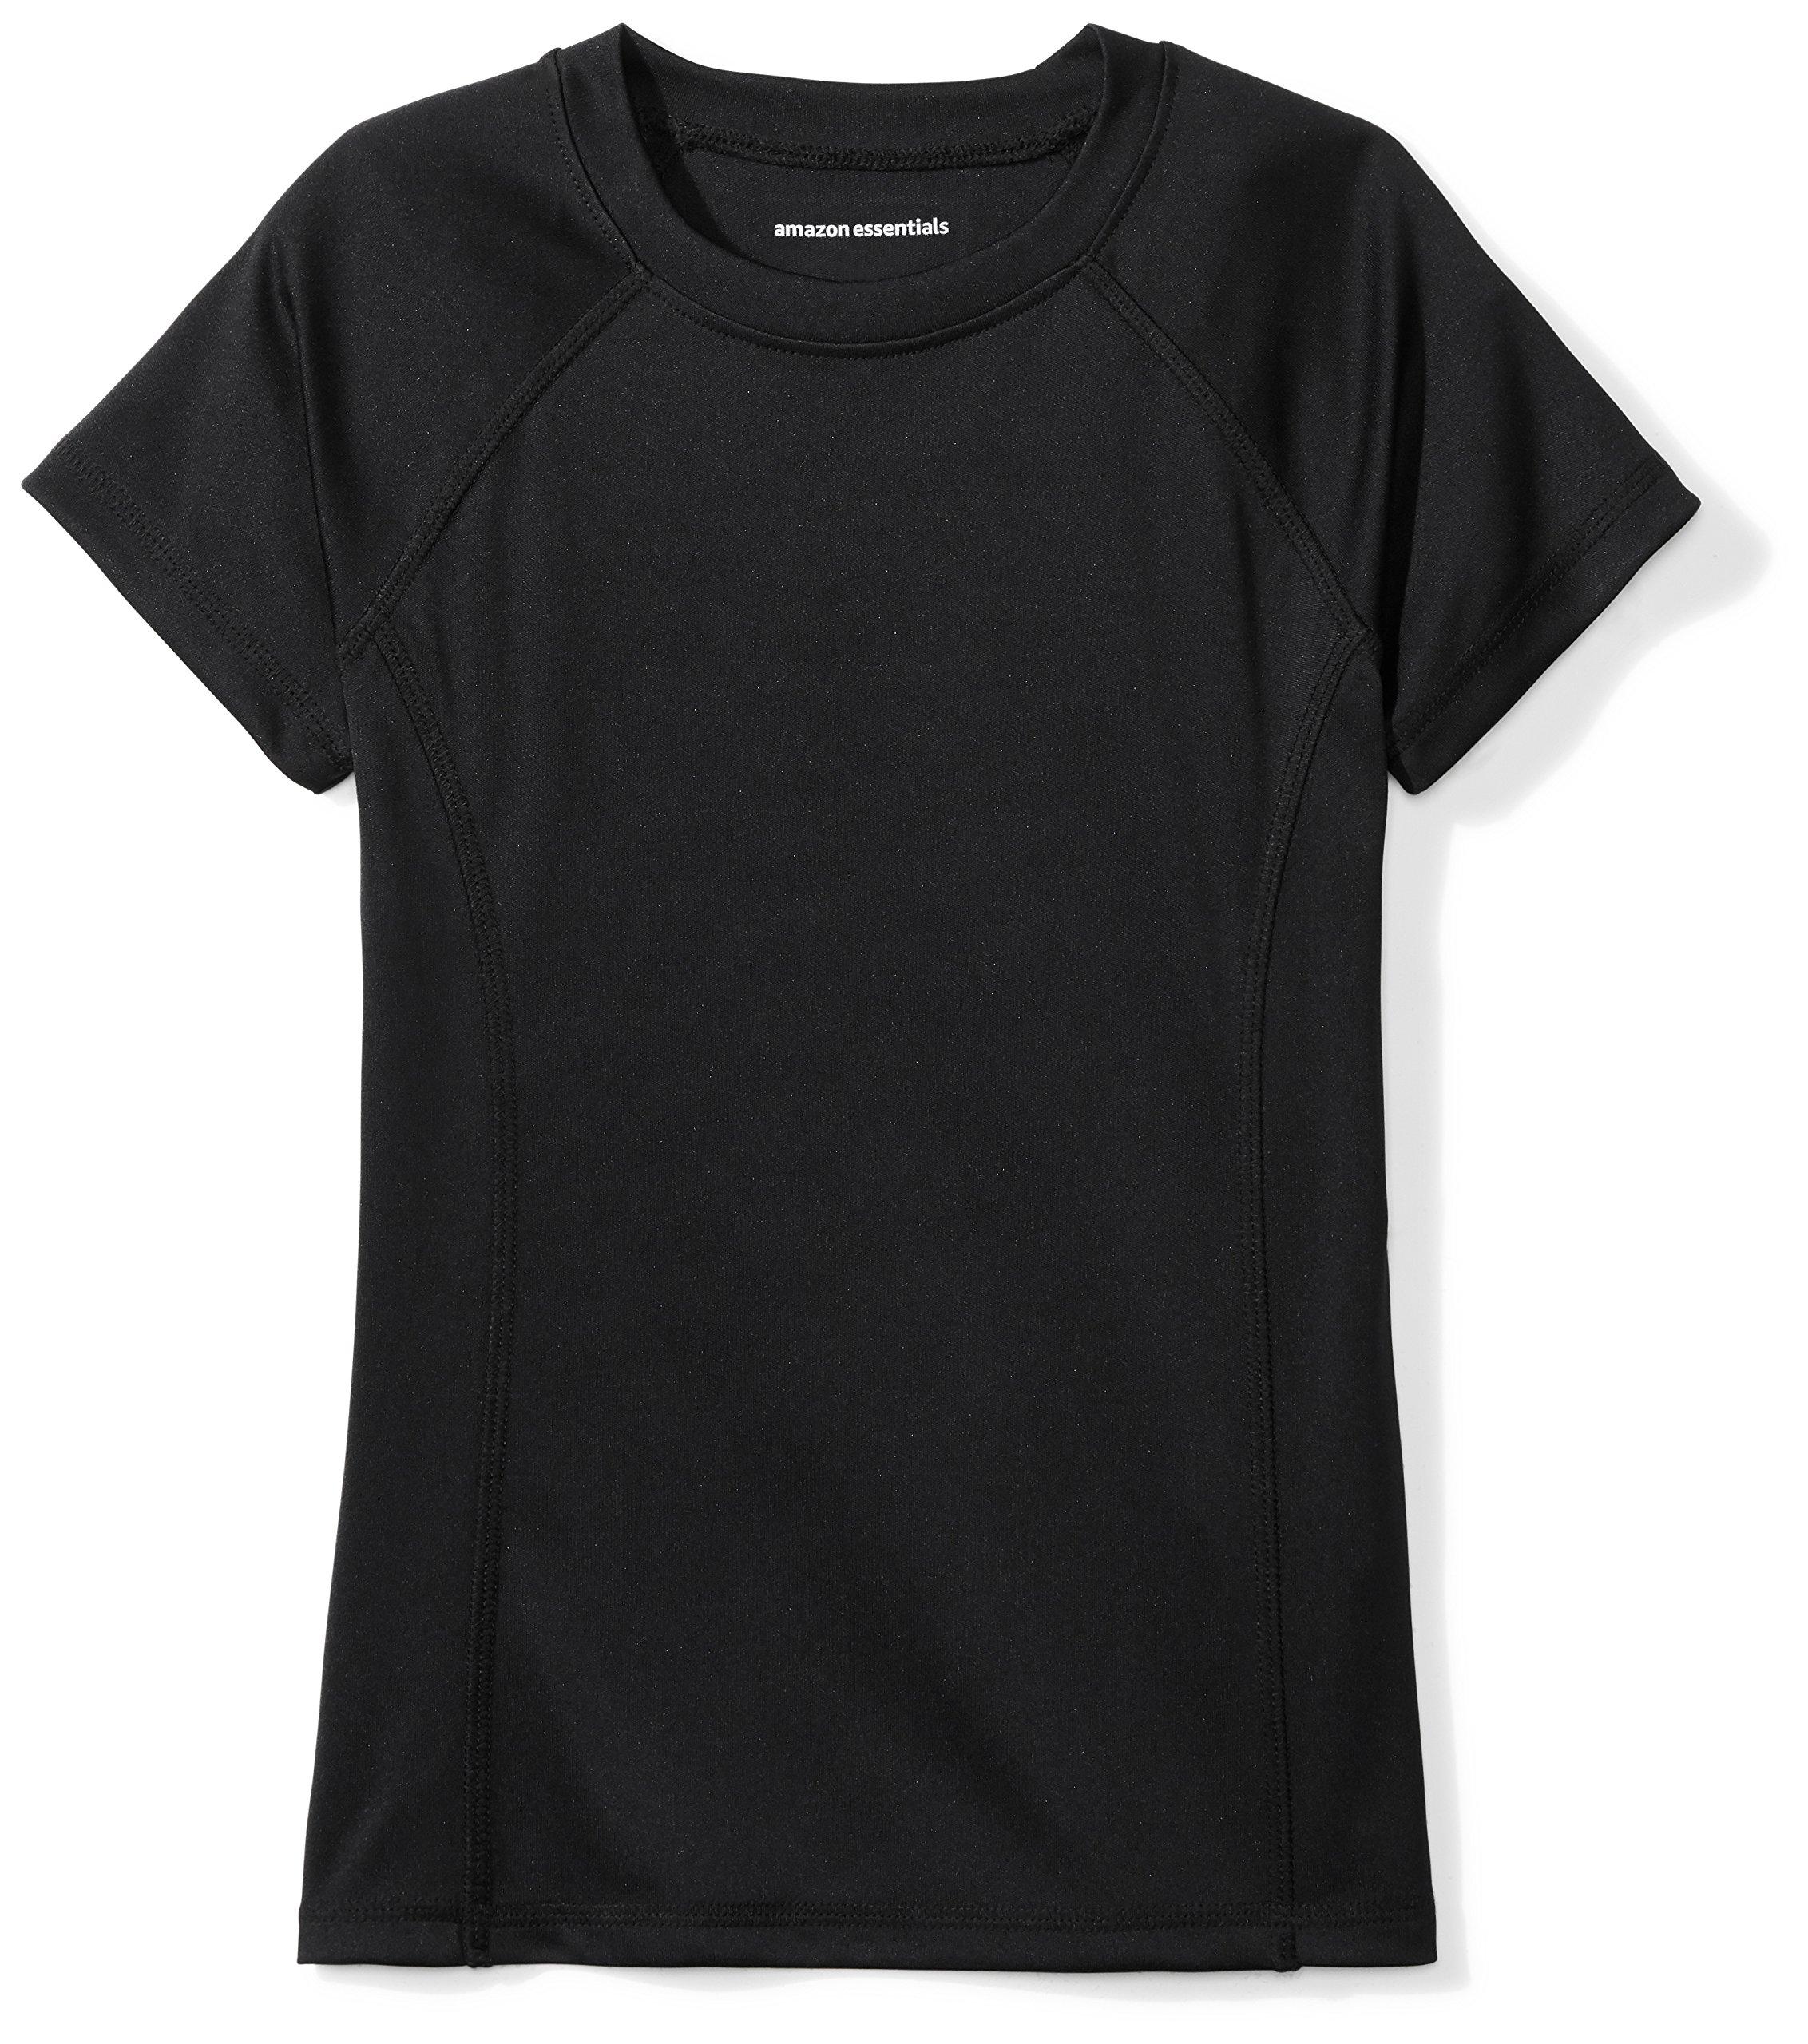 Amazon Essentials Girls' Swim Tee, Jet Black, XL (12)